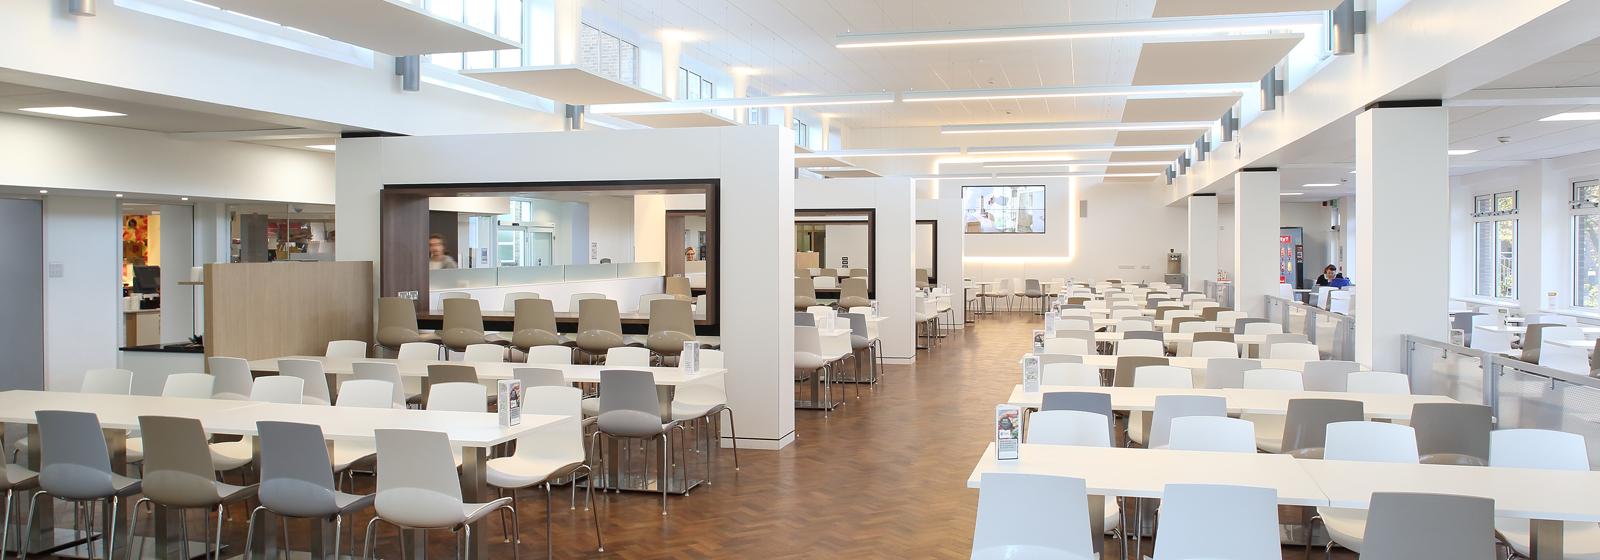 University of Worcester – Restaurant